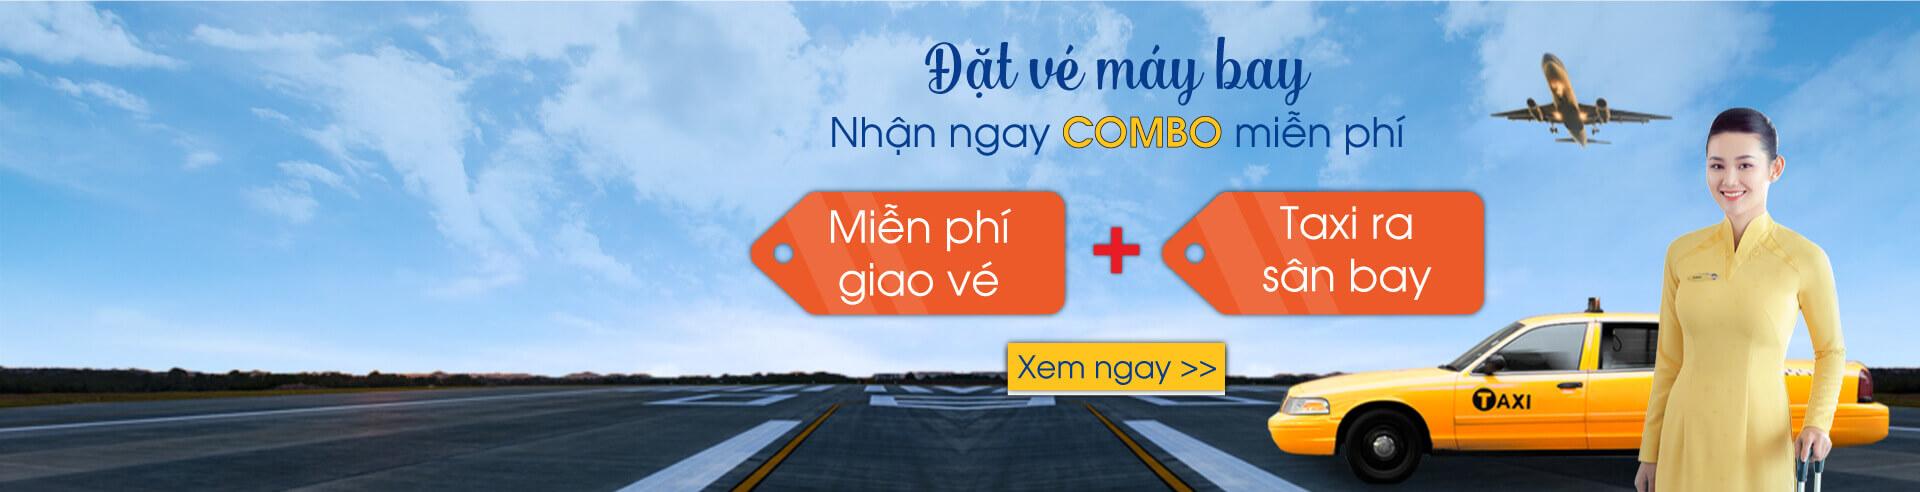 Free giao vé + Taxi